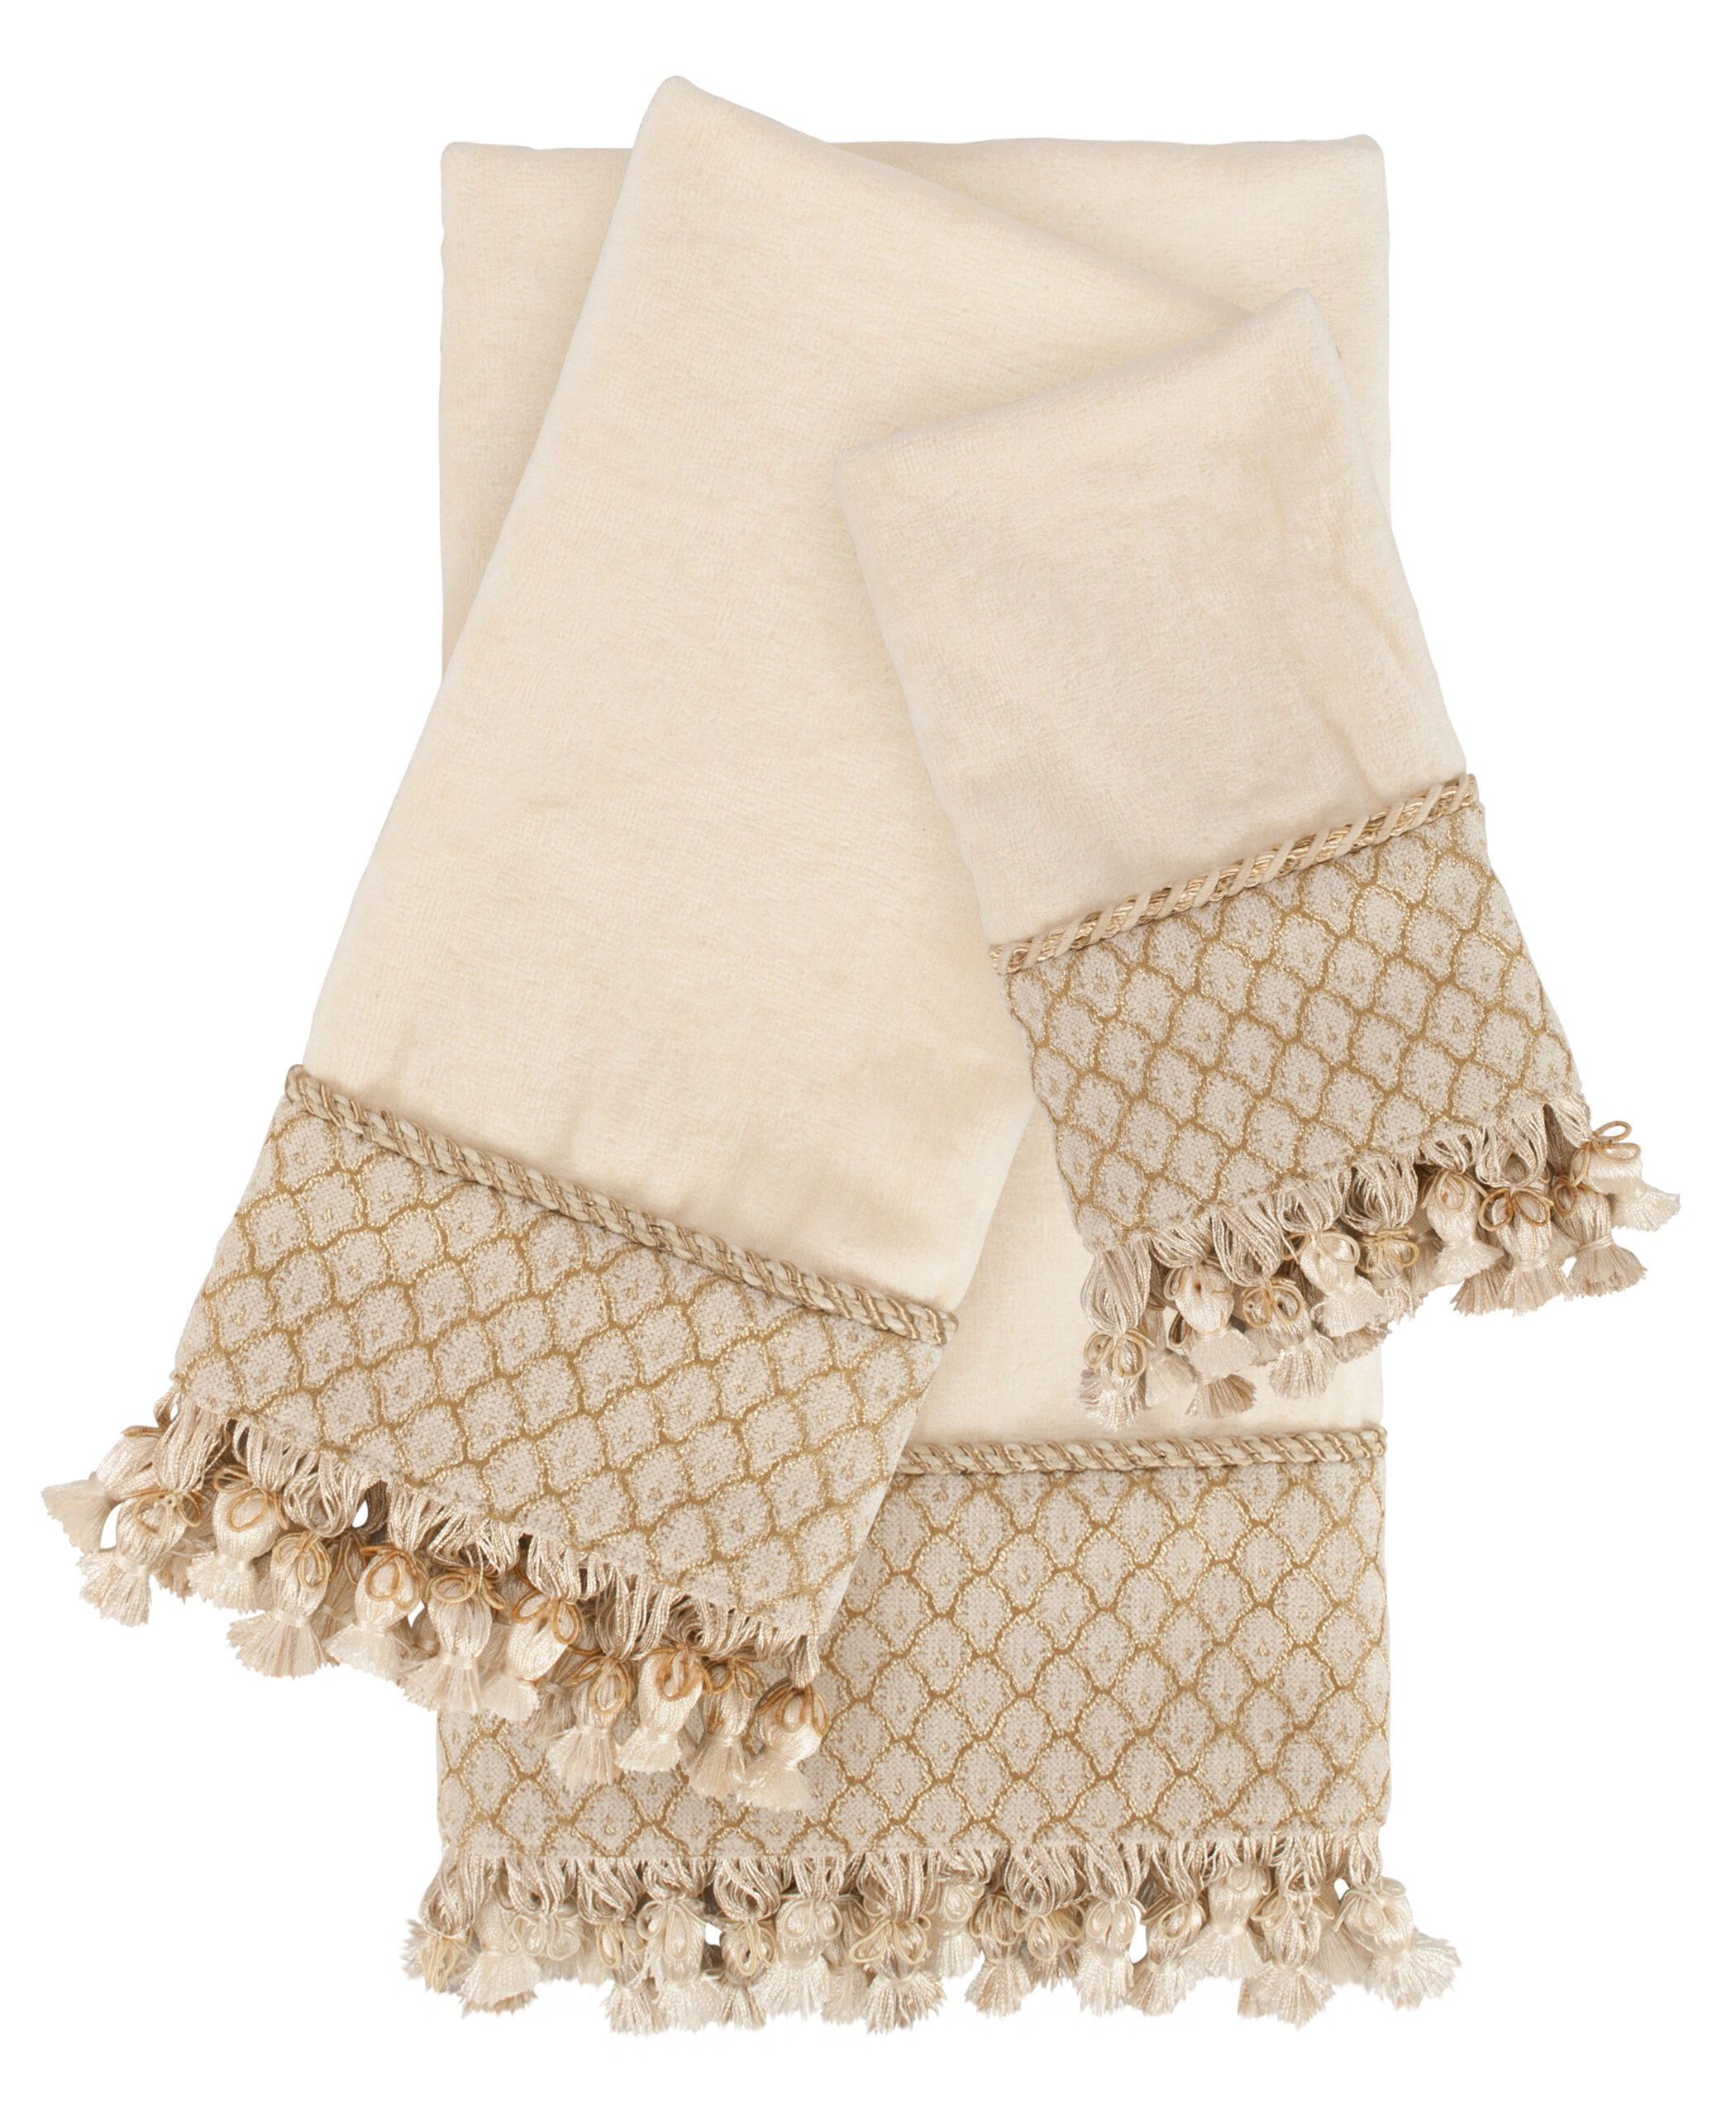 Charlton Home Bonniton Luxury 3 Piece 100 Cotton Towel Set Reviews Wayfair